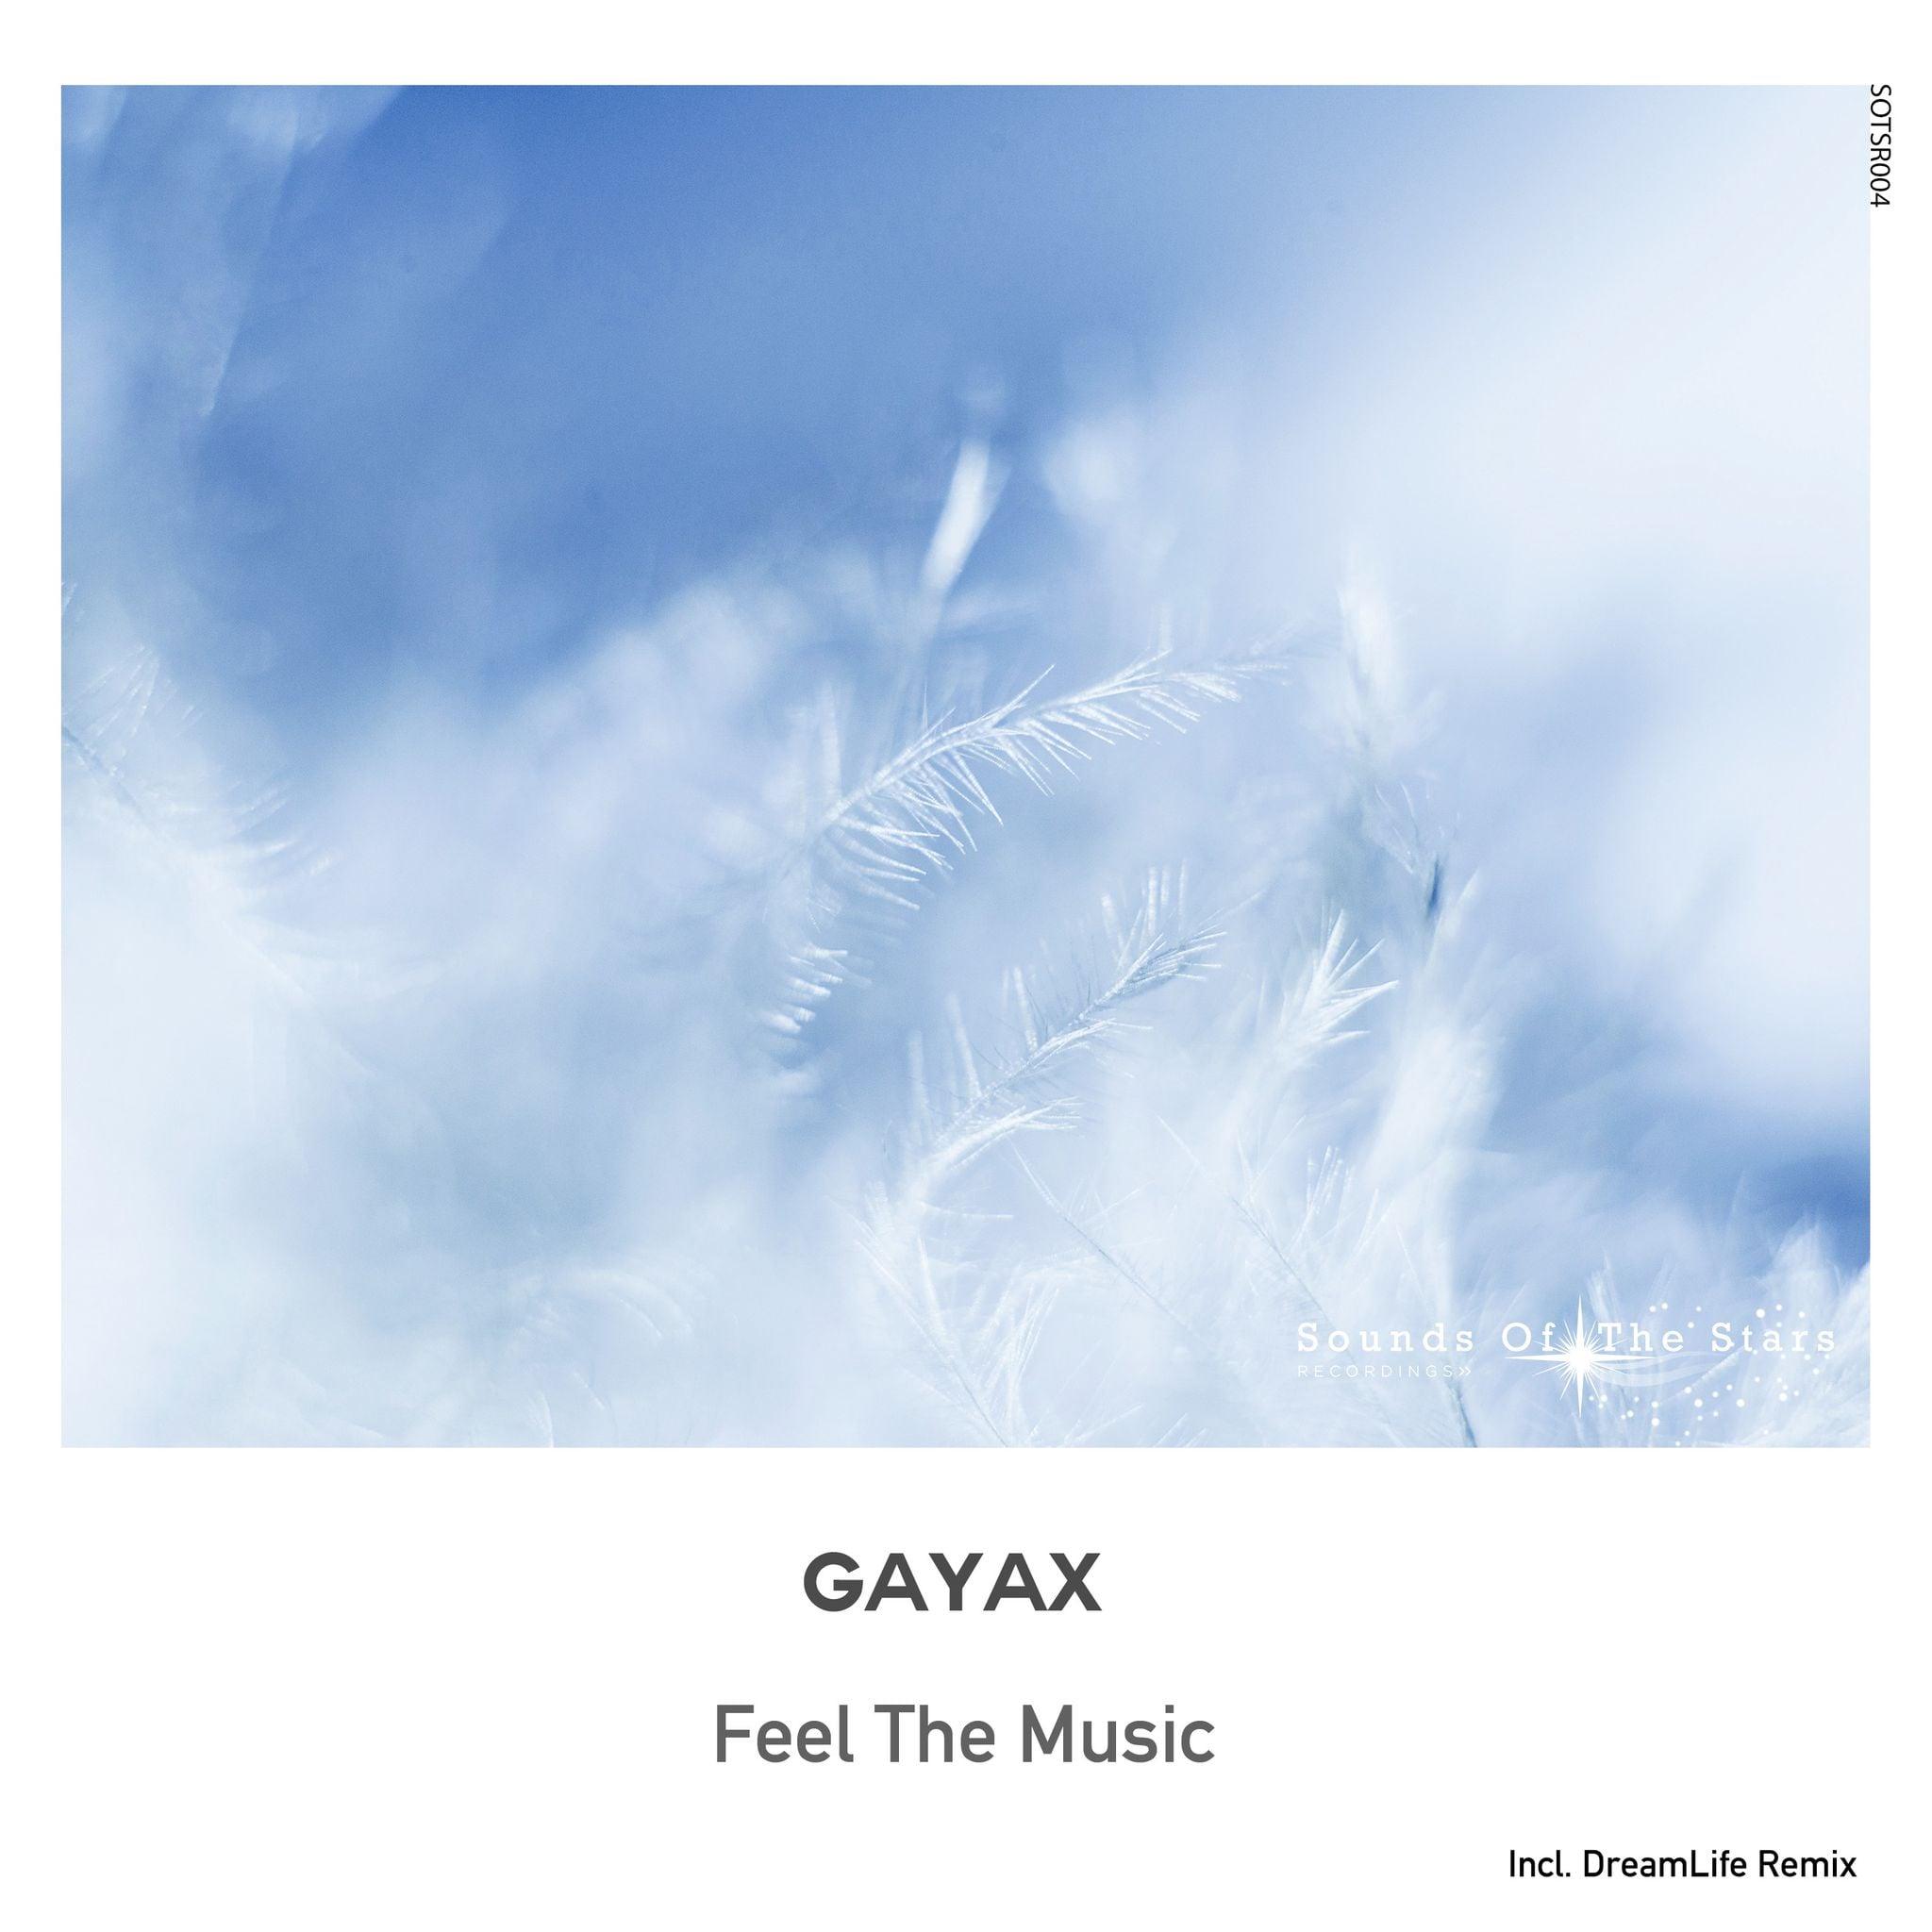 Gayax - Feel The Music (DreamLife Remix)